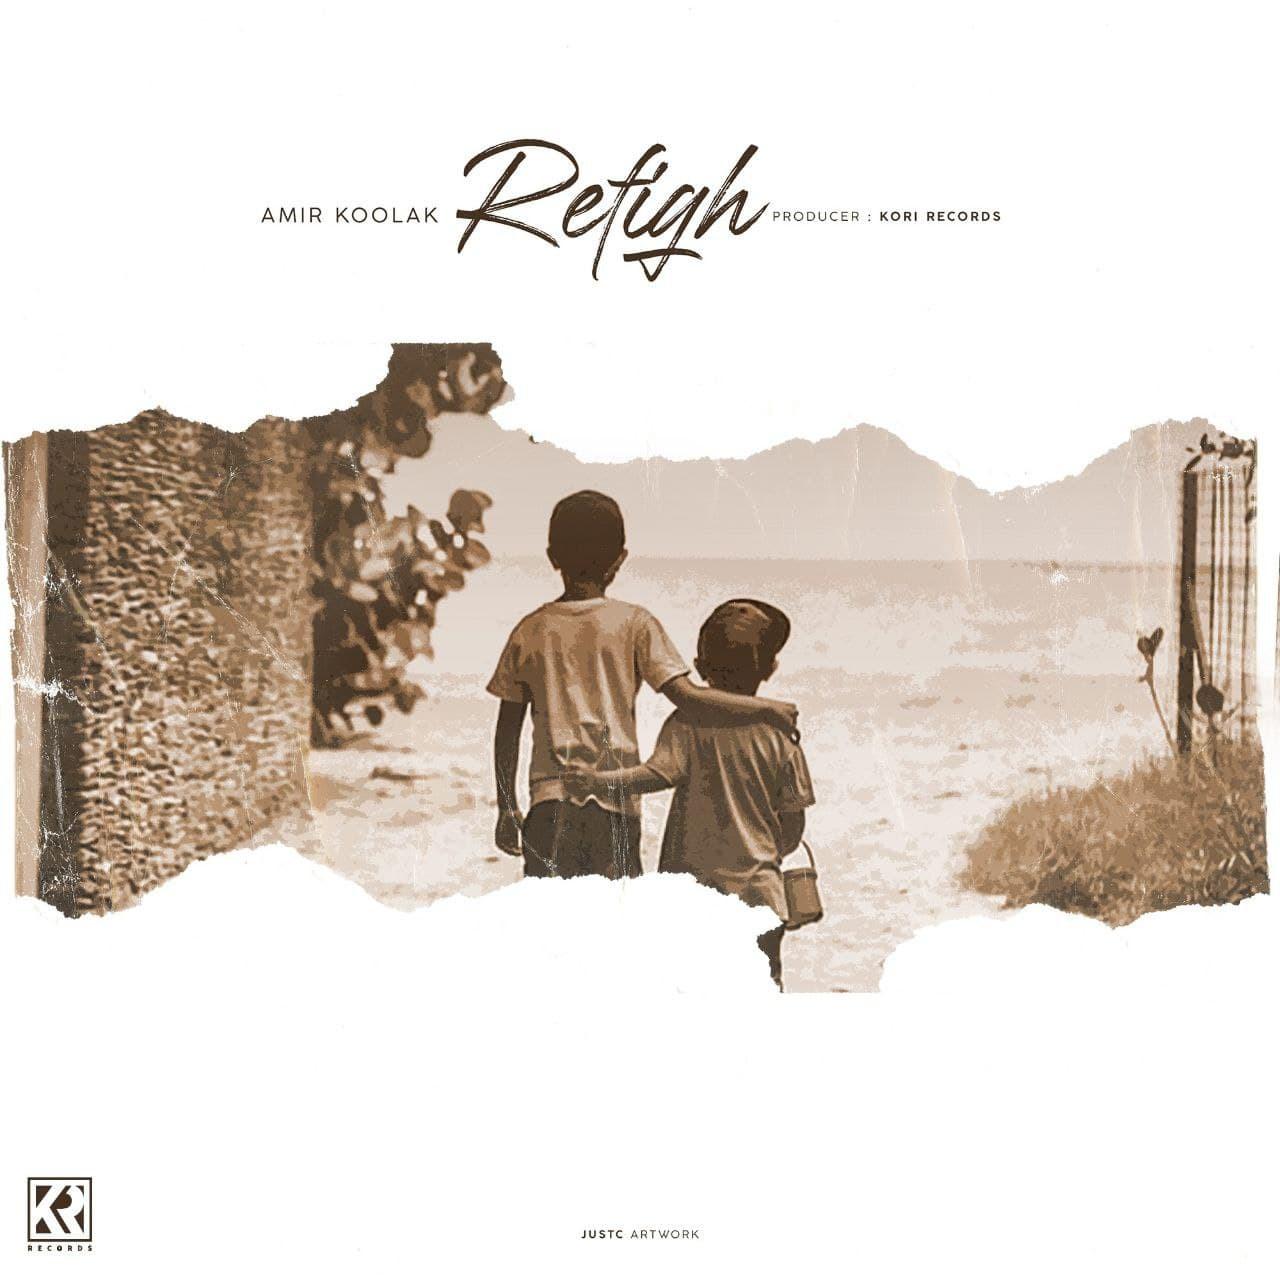 Amir Koolak - Refigh